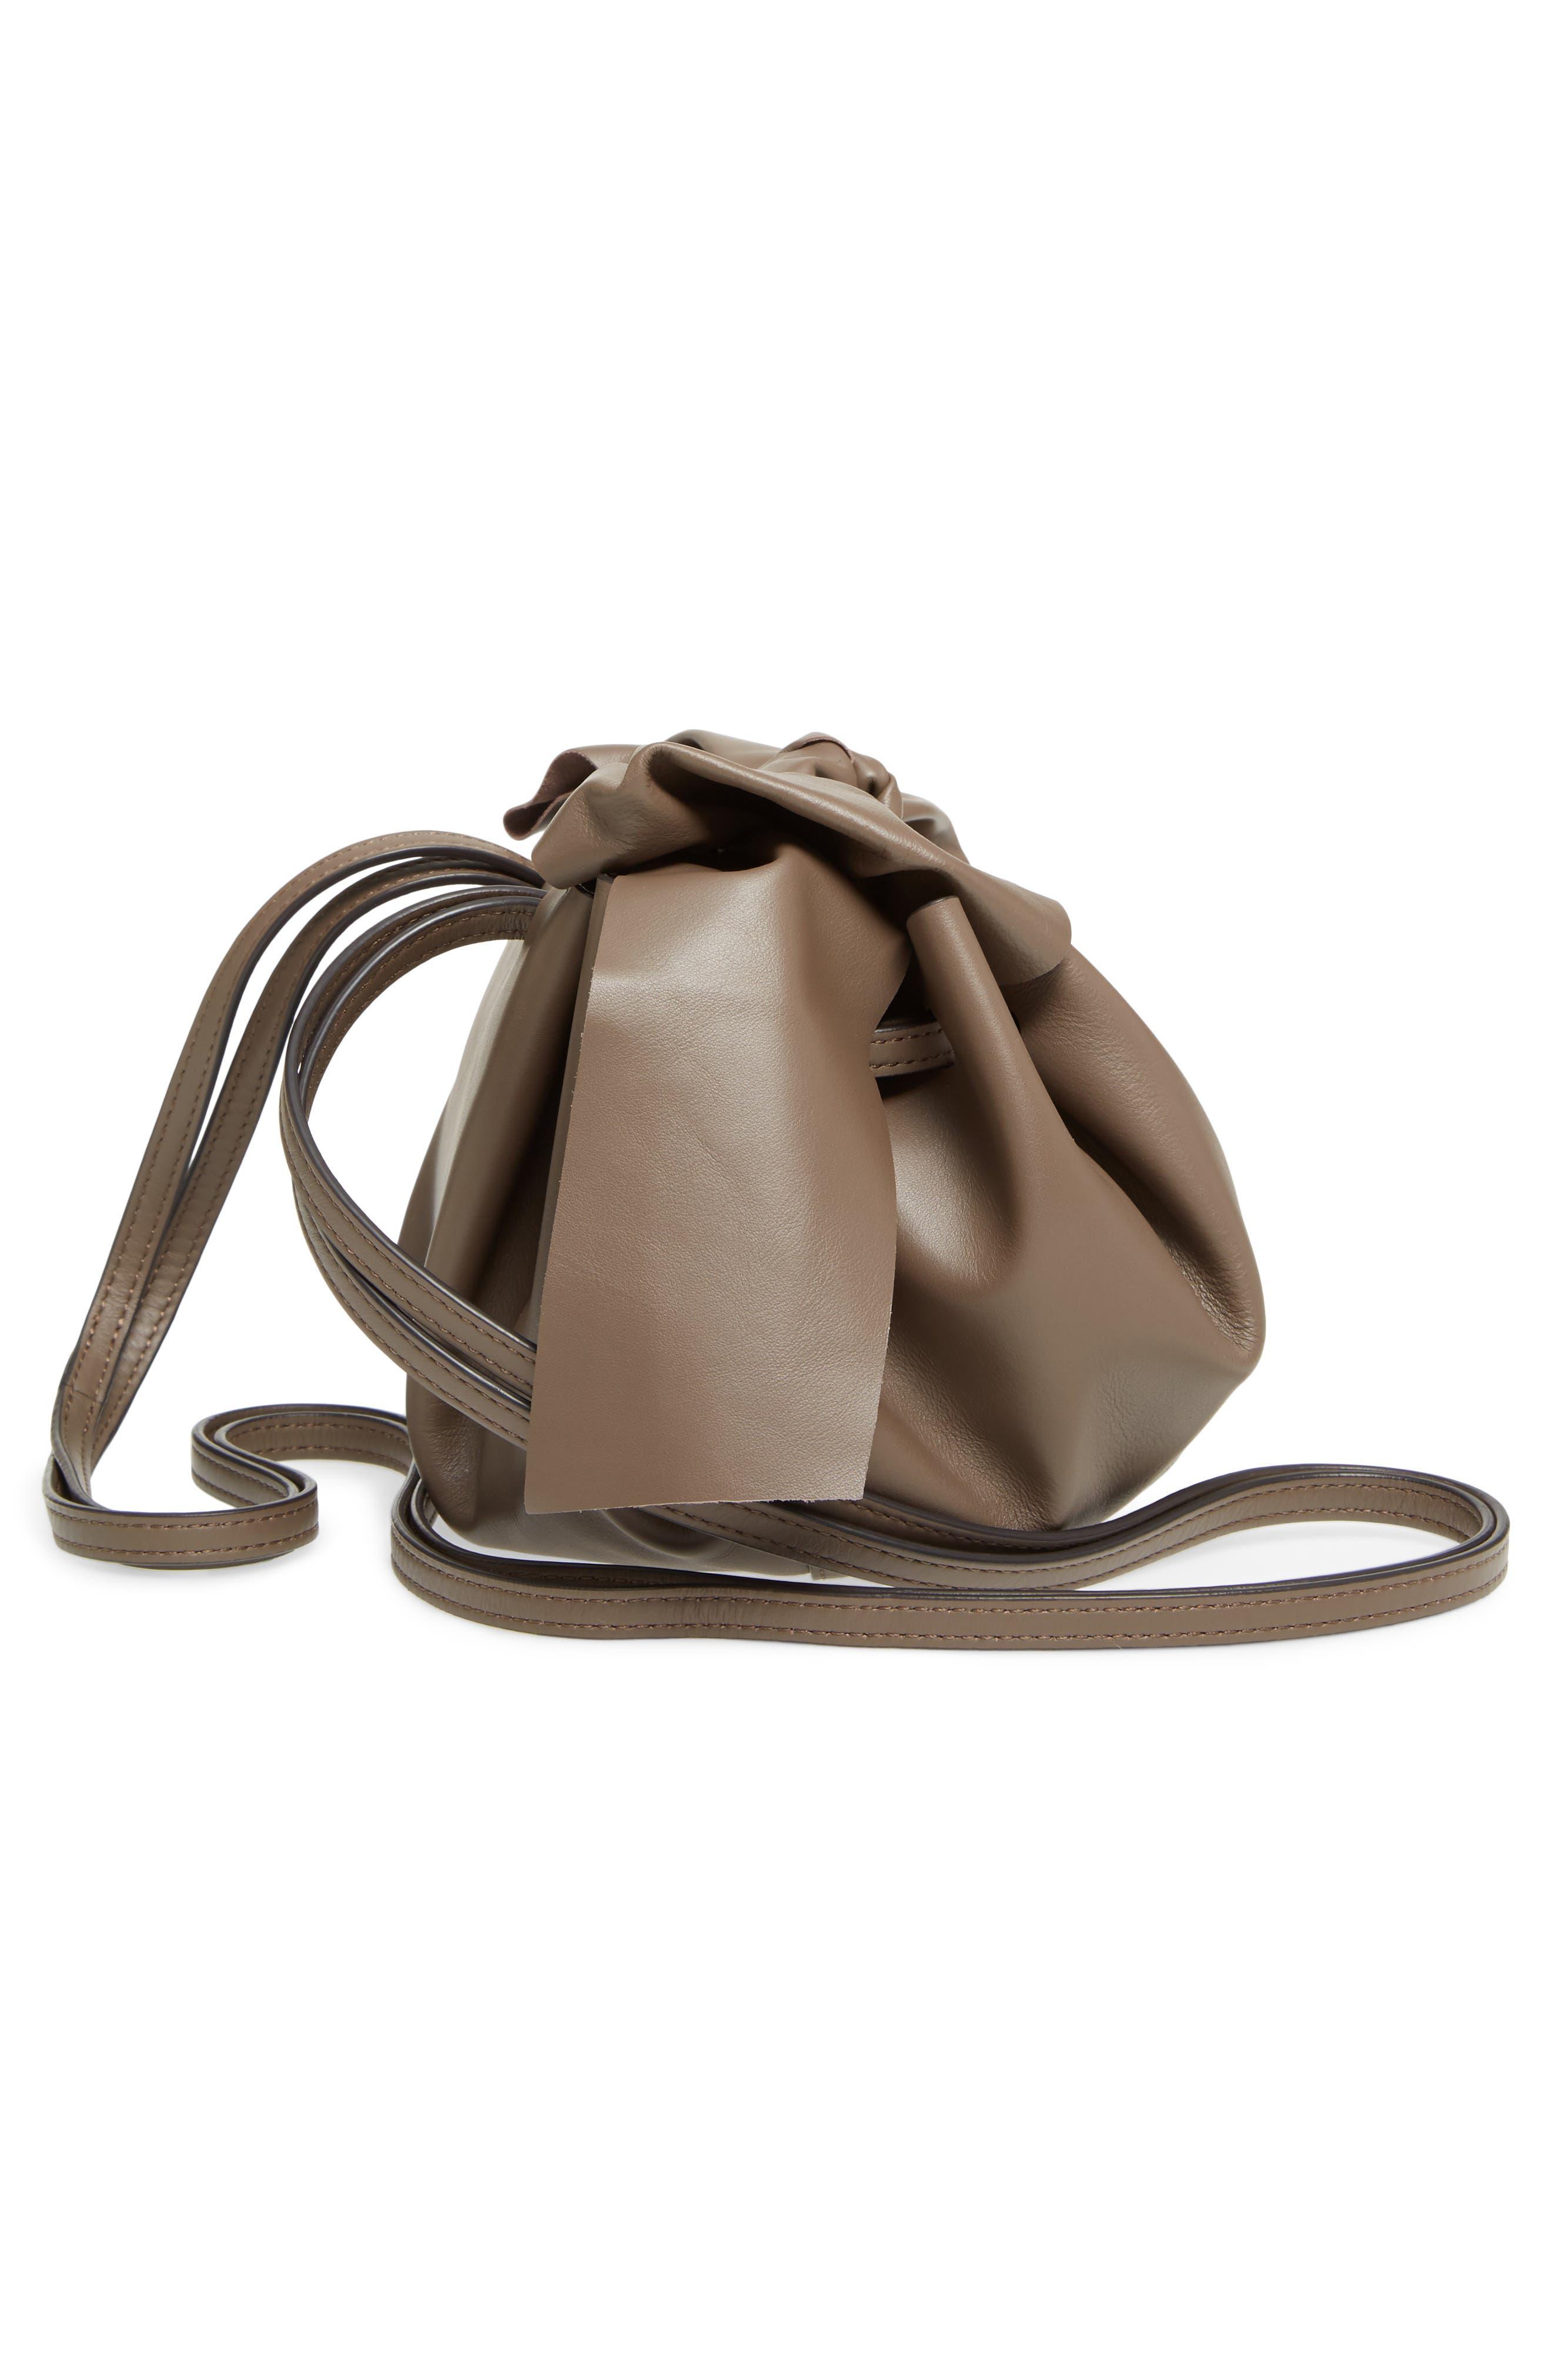 Soiree Leather Crossbody Bag,                             Alternate thumbnail 4, color,                             Mockingbird